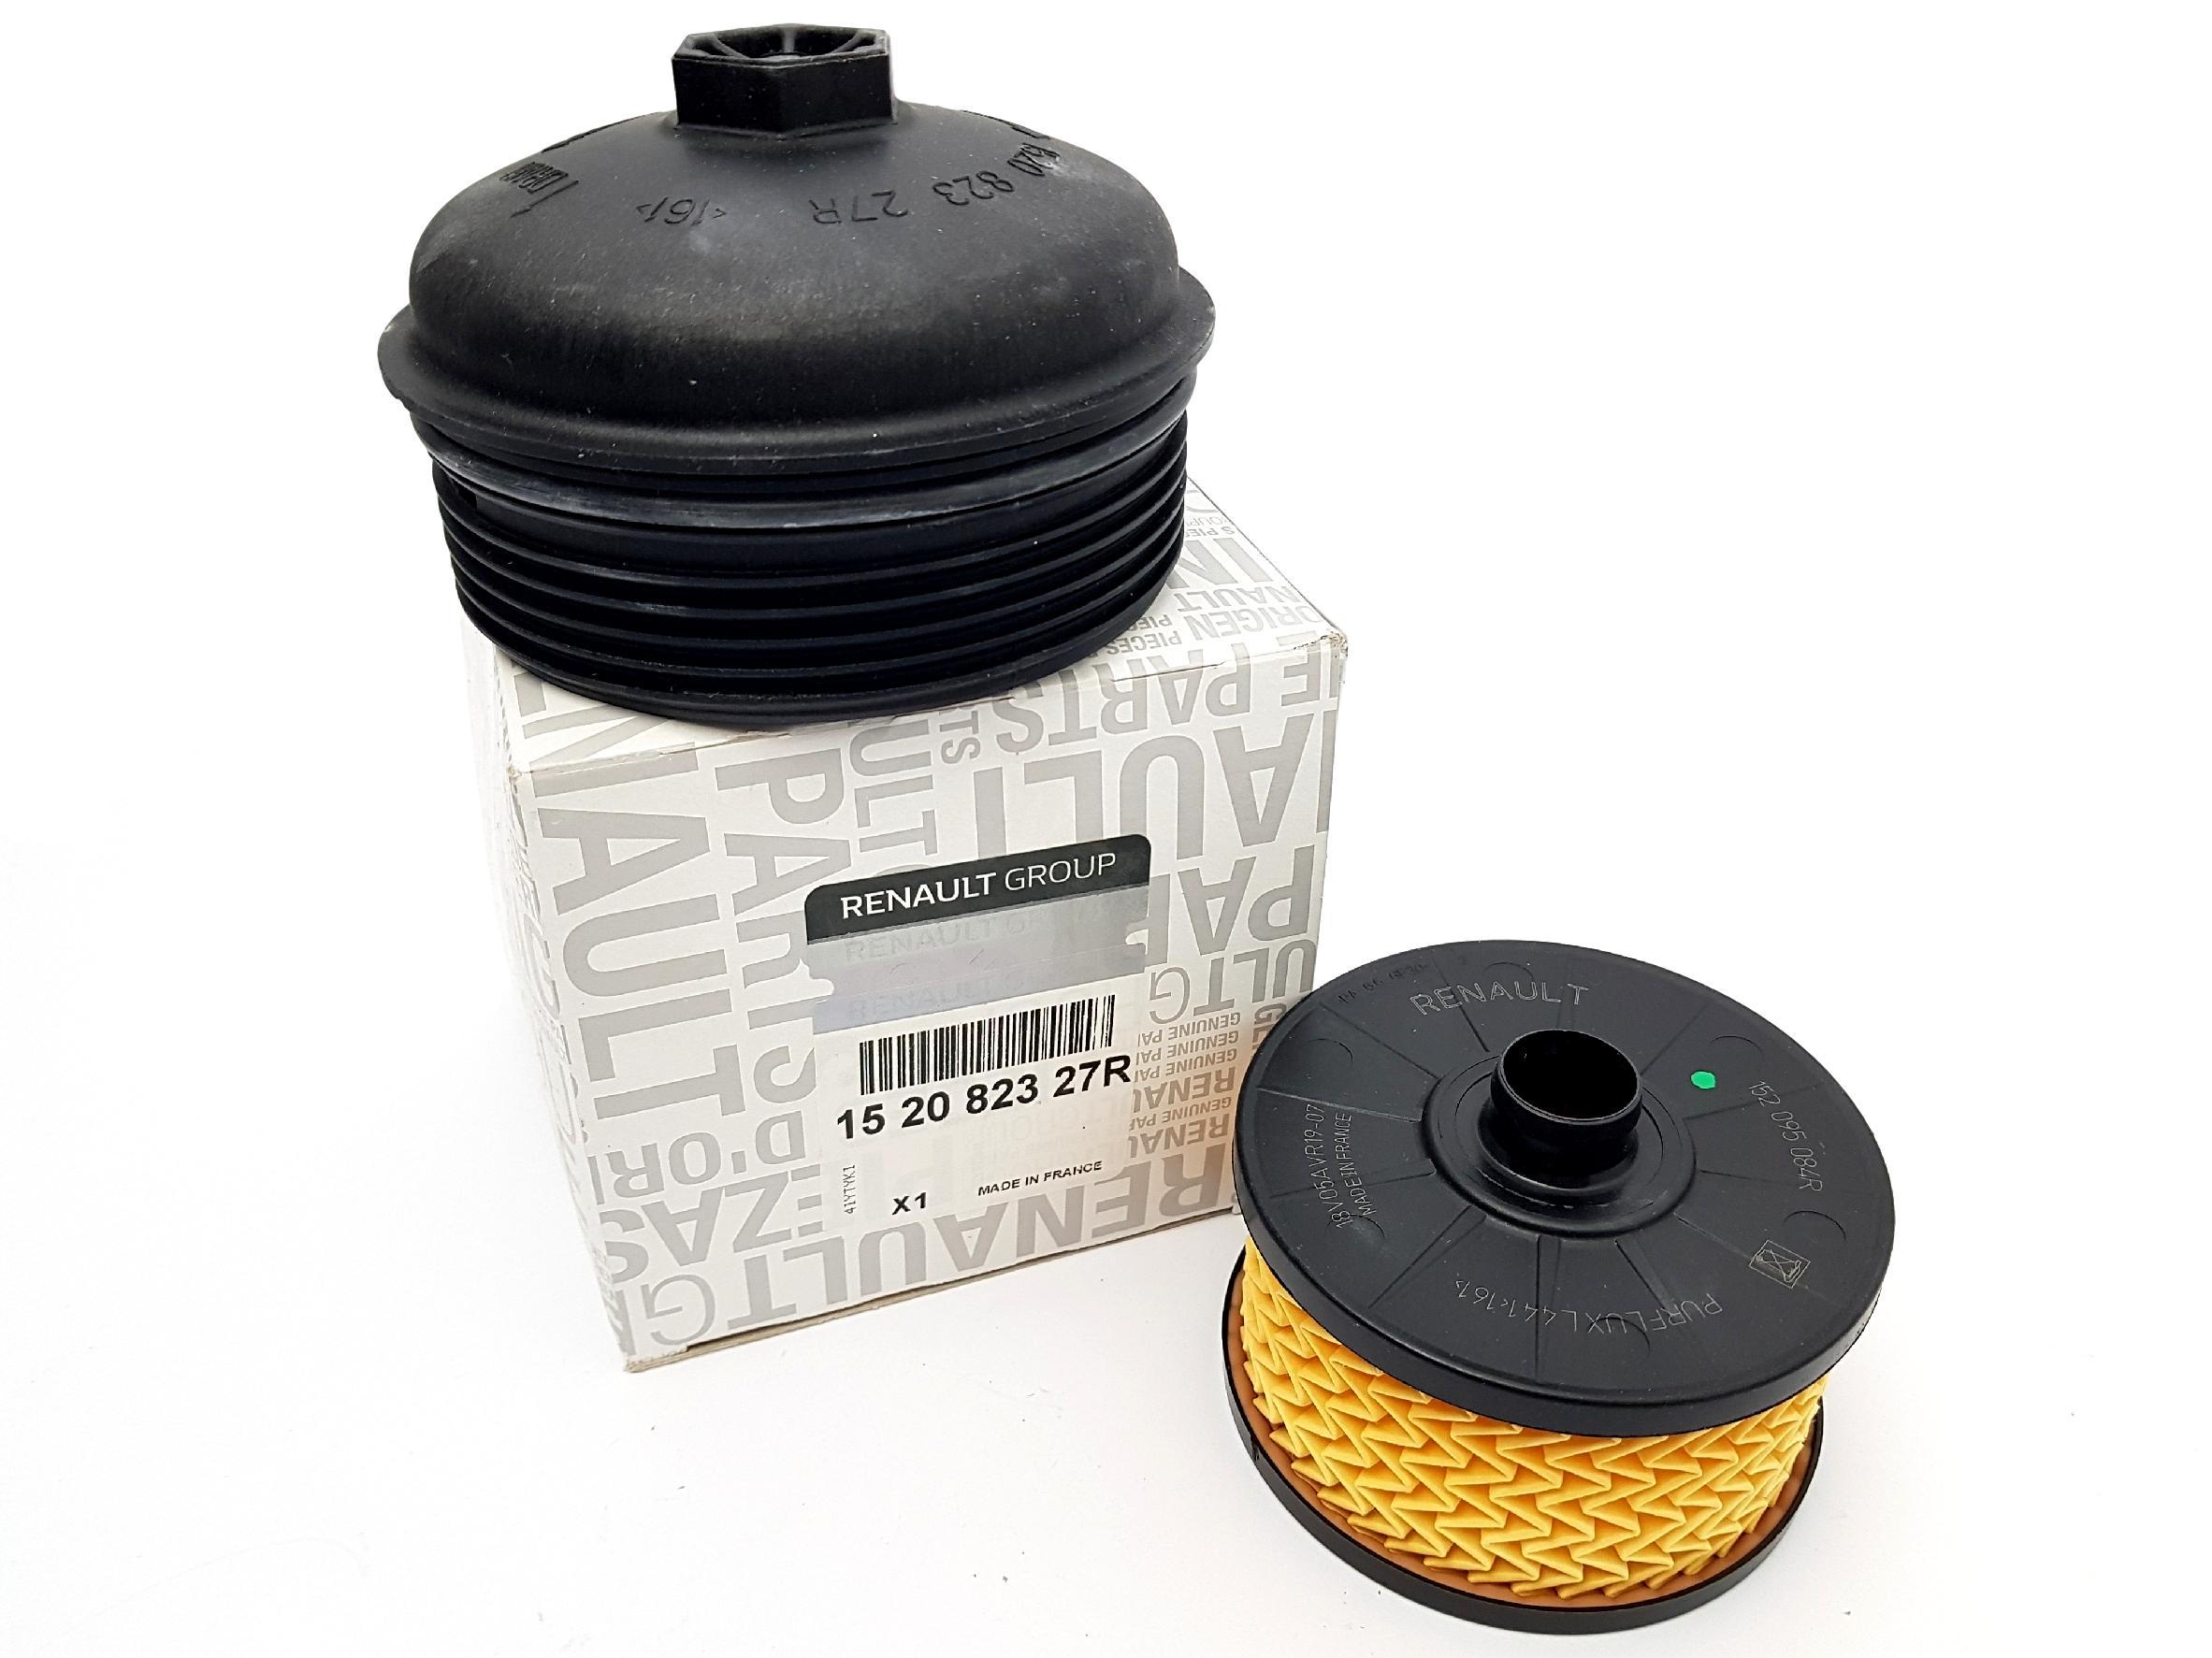 Oil Filter Renault Clio 1.2 16v 1149 PETROL 12//00-4//01